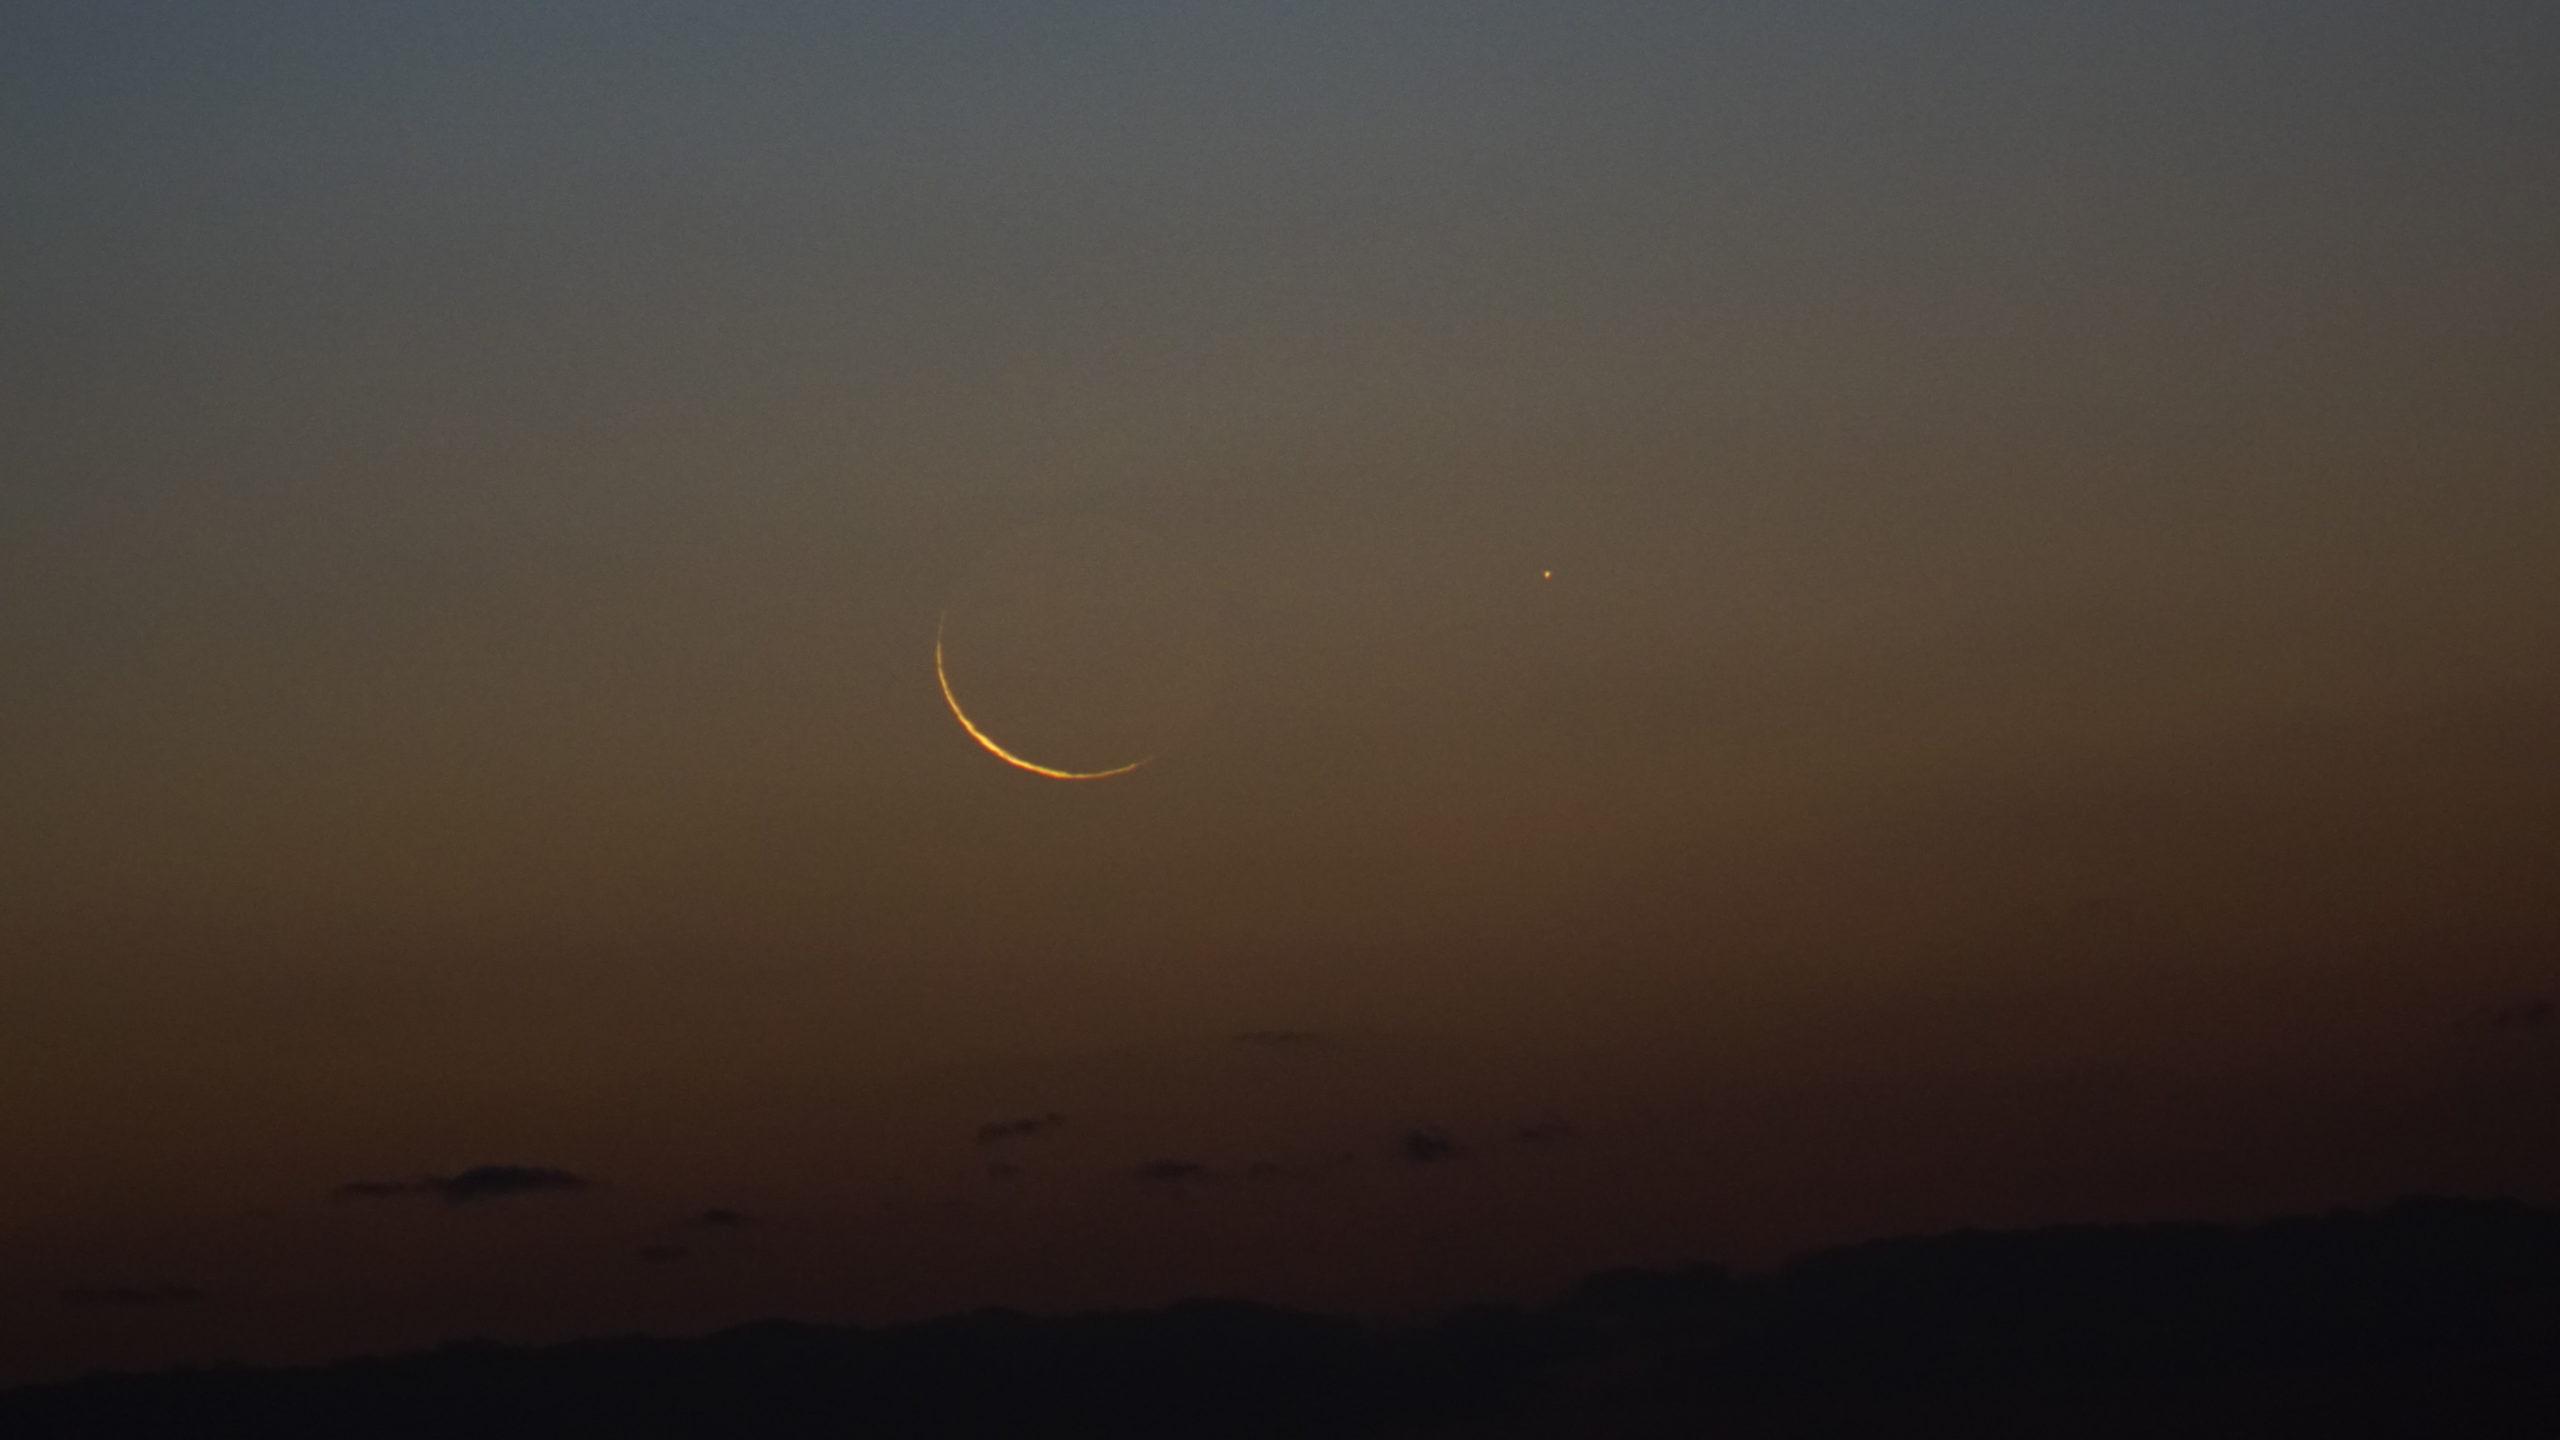 Foto bulan sabit tipis 1 Jumadil Awal 1441 Hijriyah dari Fremantle, Australia Barat pada petang hari Jumat, 27 Desember 2019.